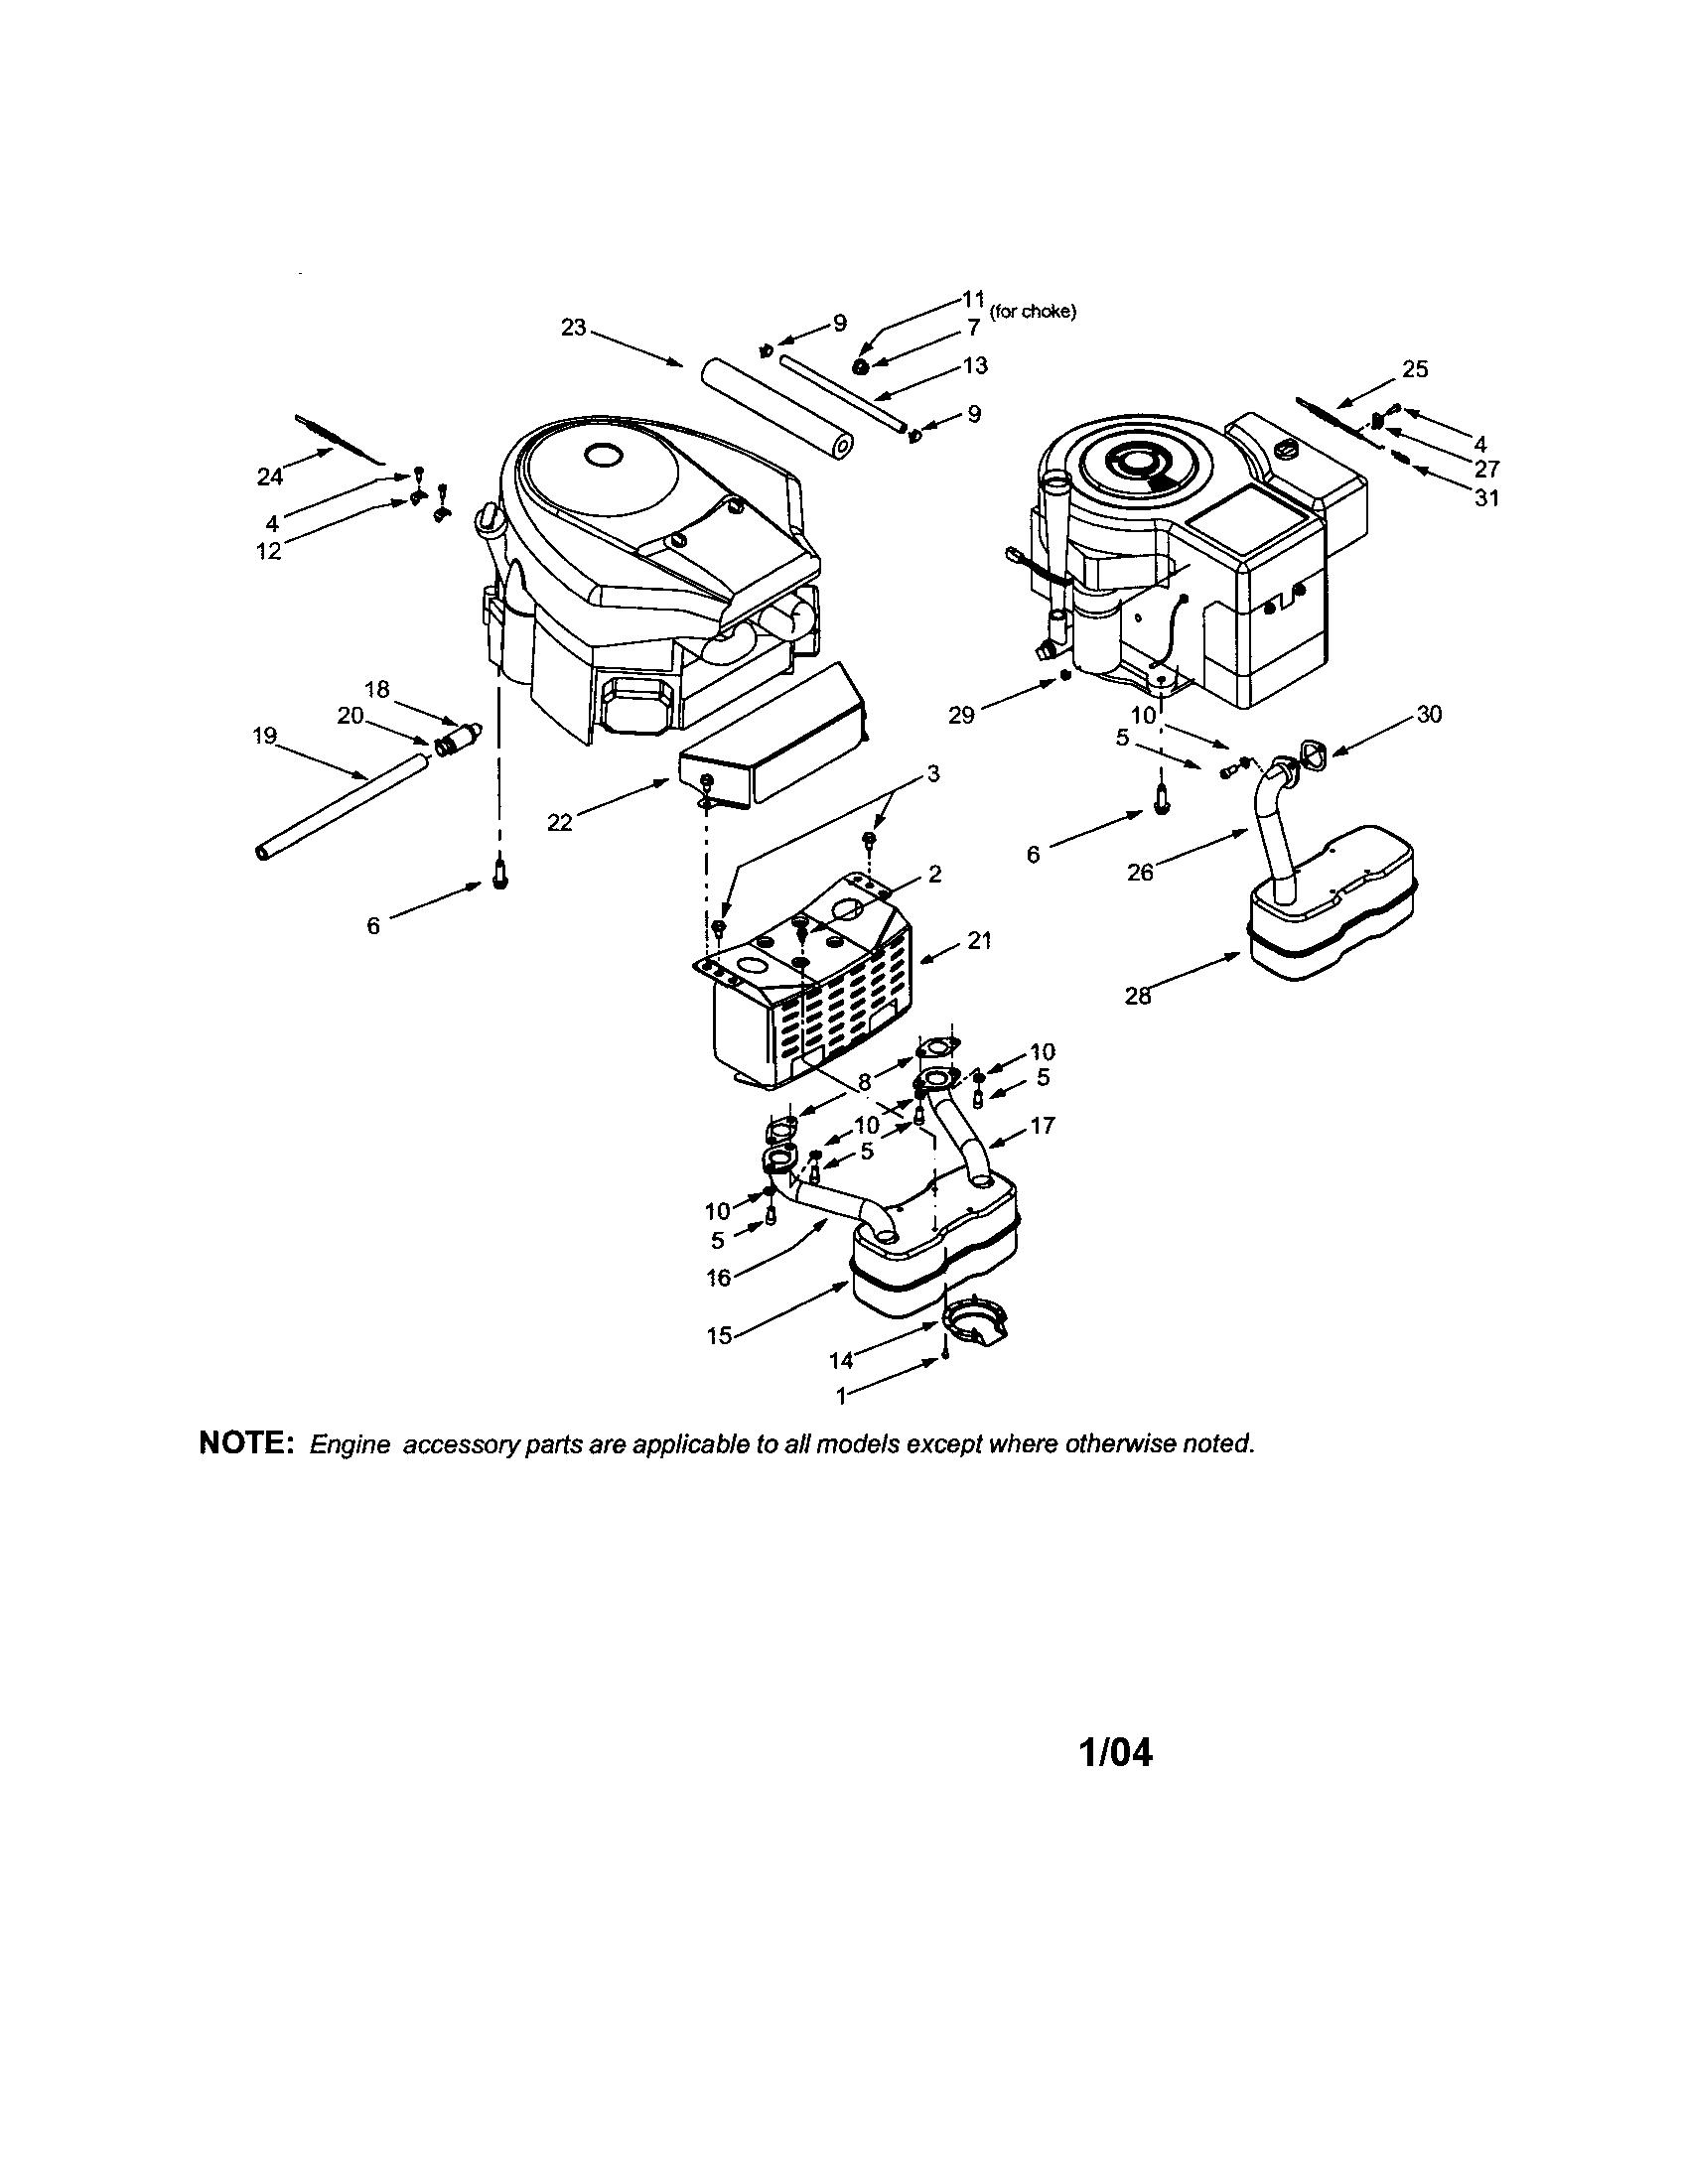 Manual Ltx 1000 Craftsman Parts